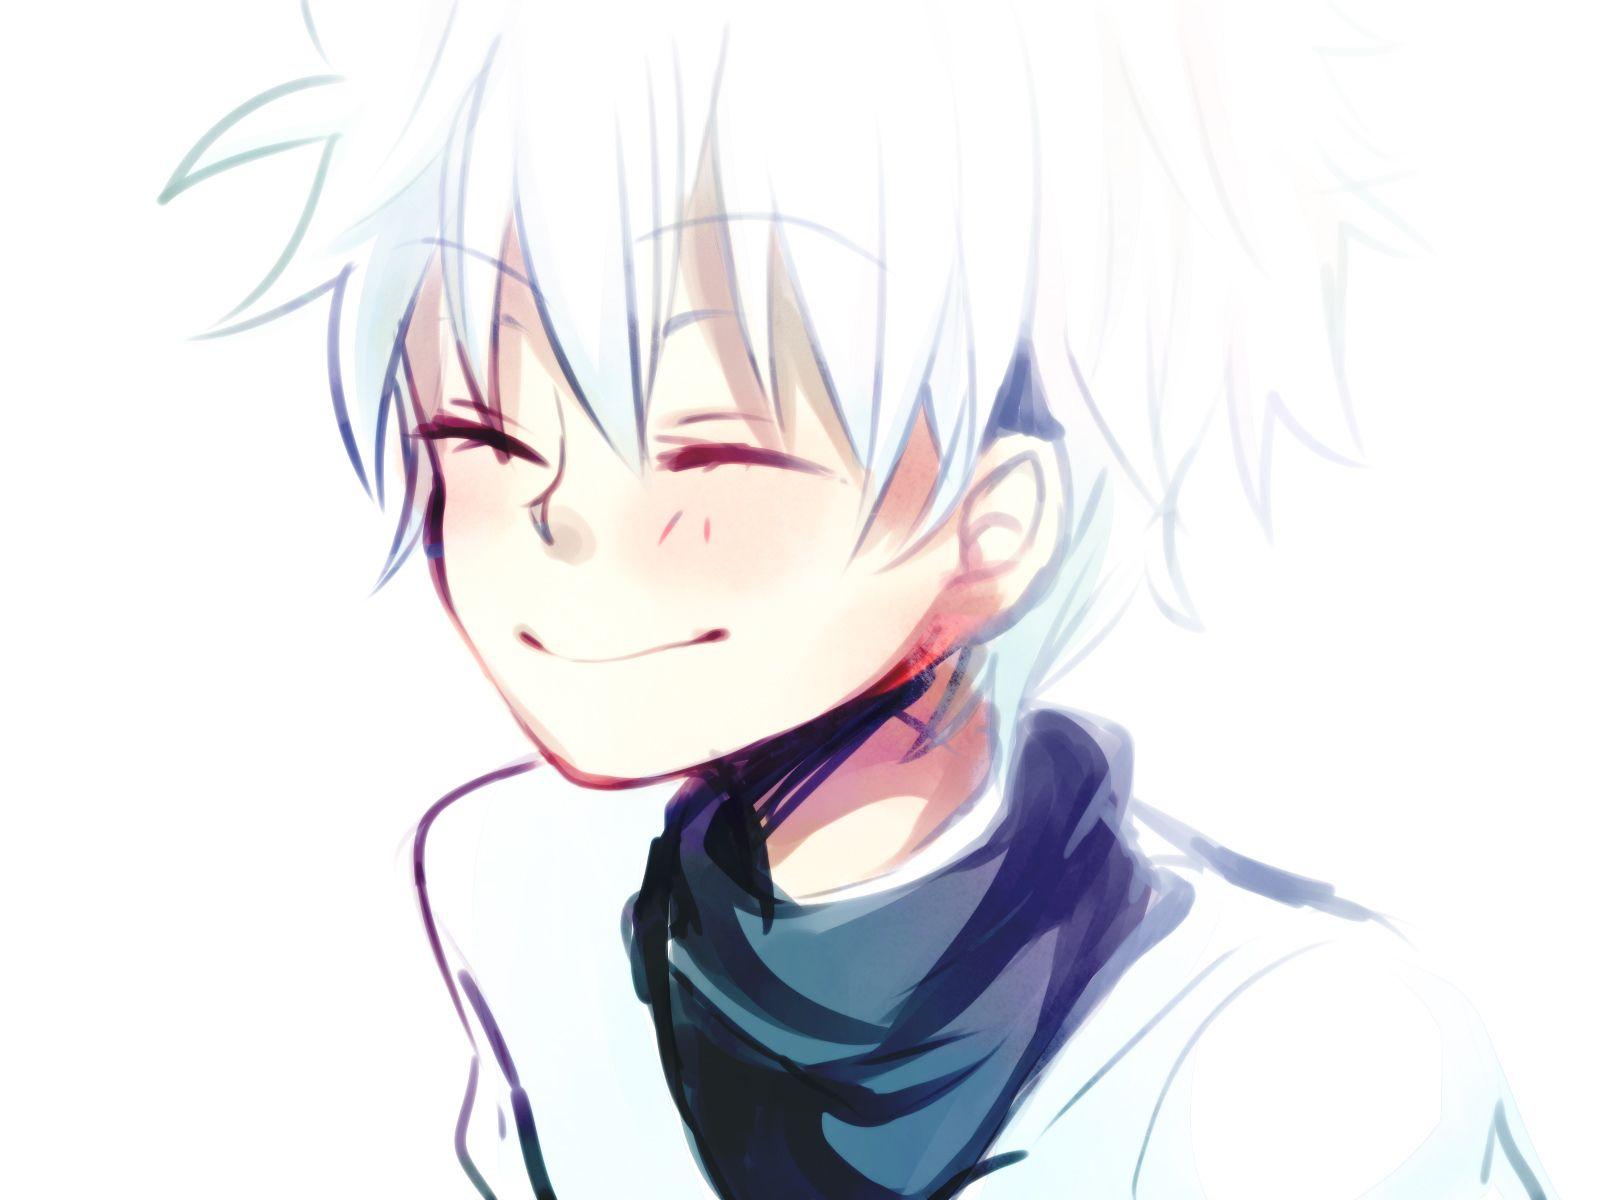 {title} imagens) Papel de parede anime, Anime